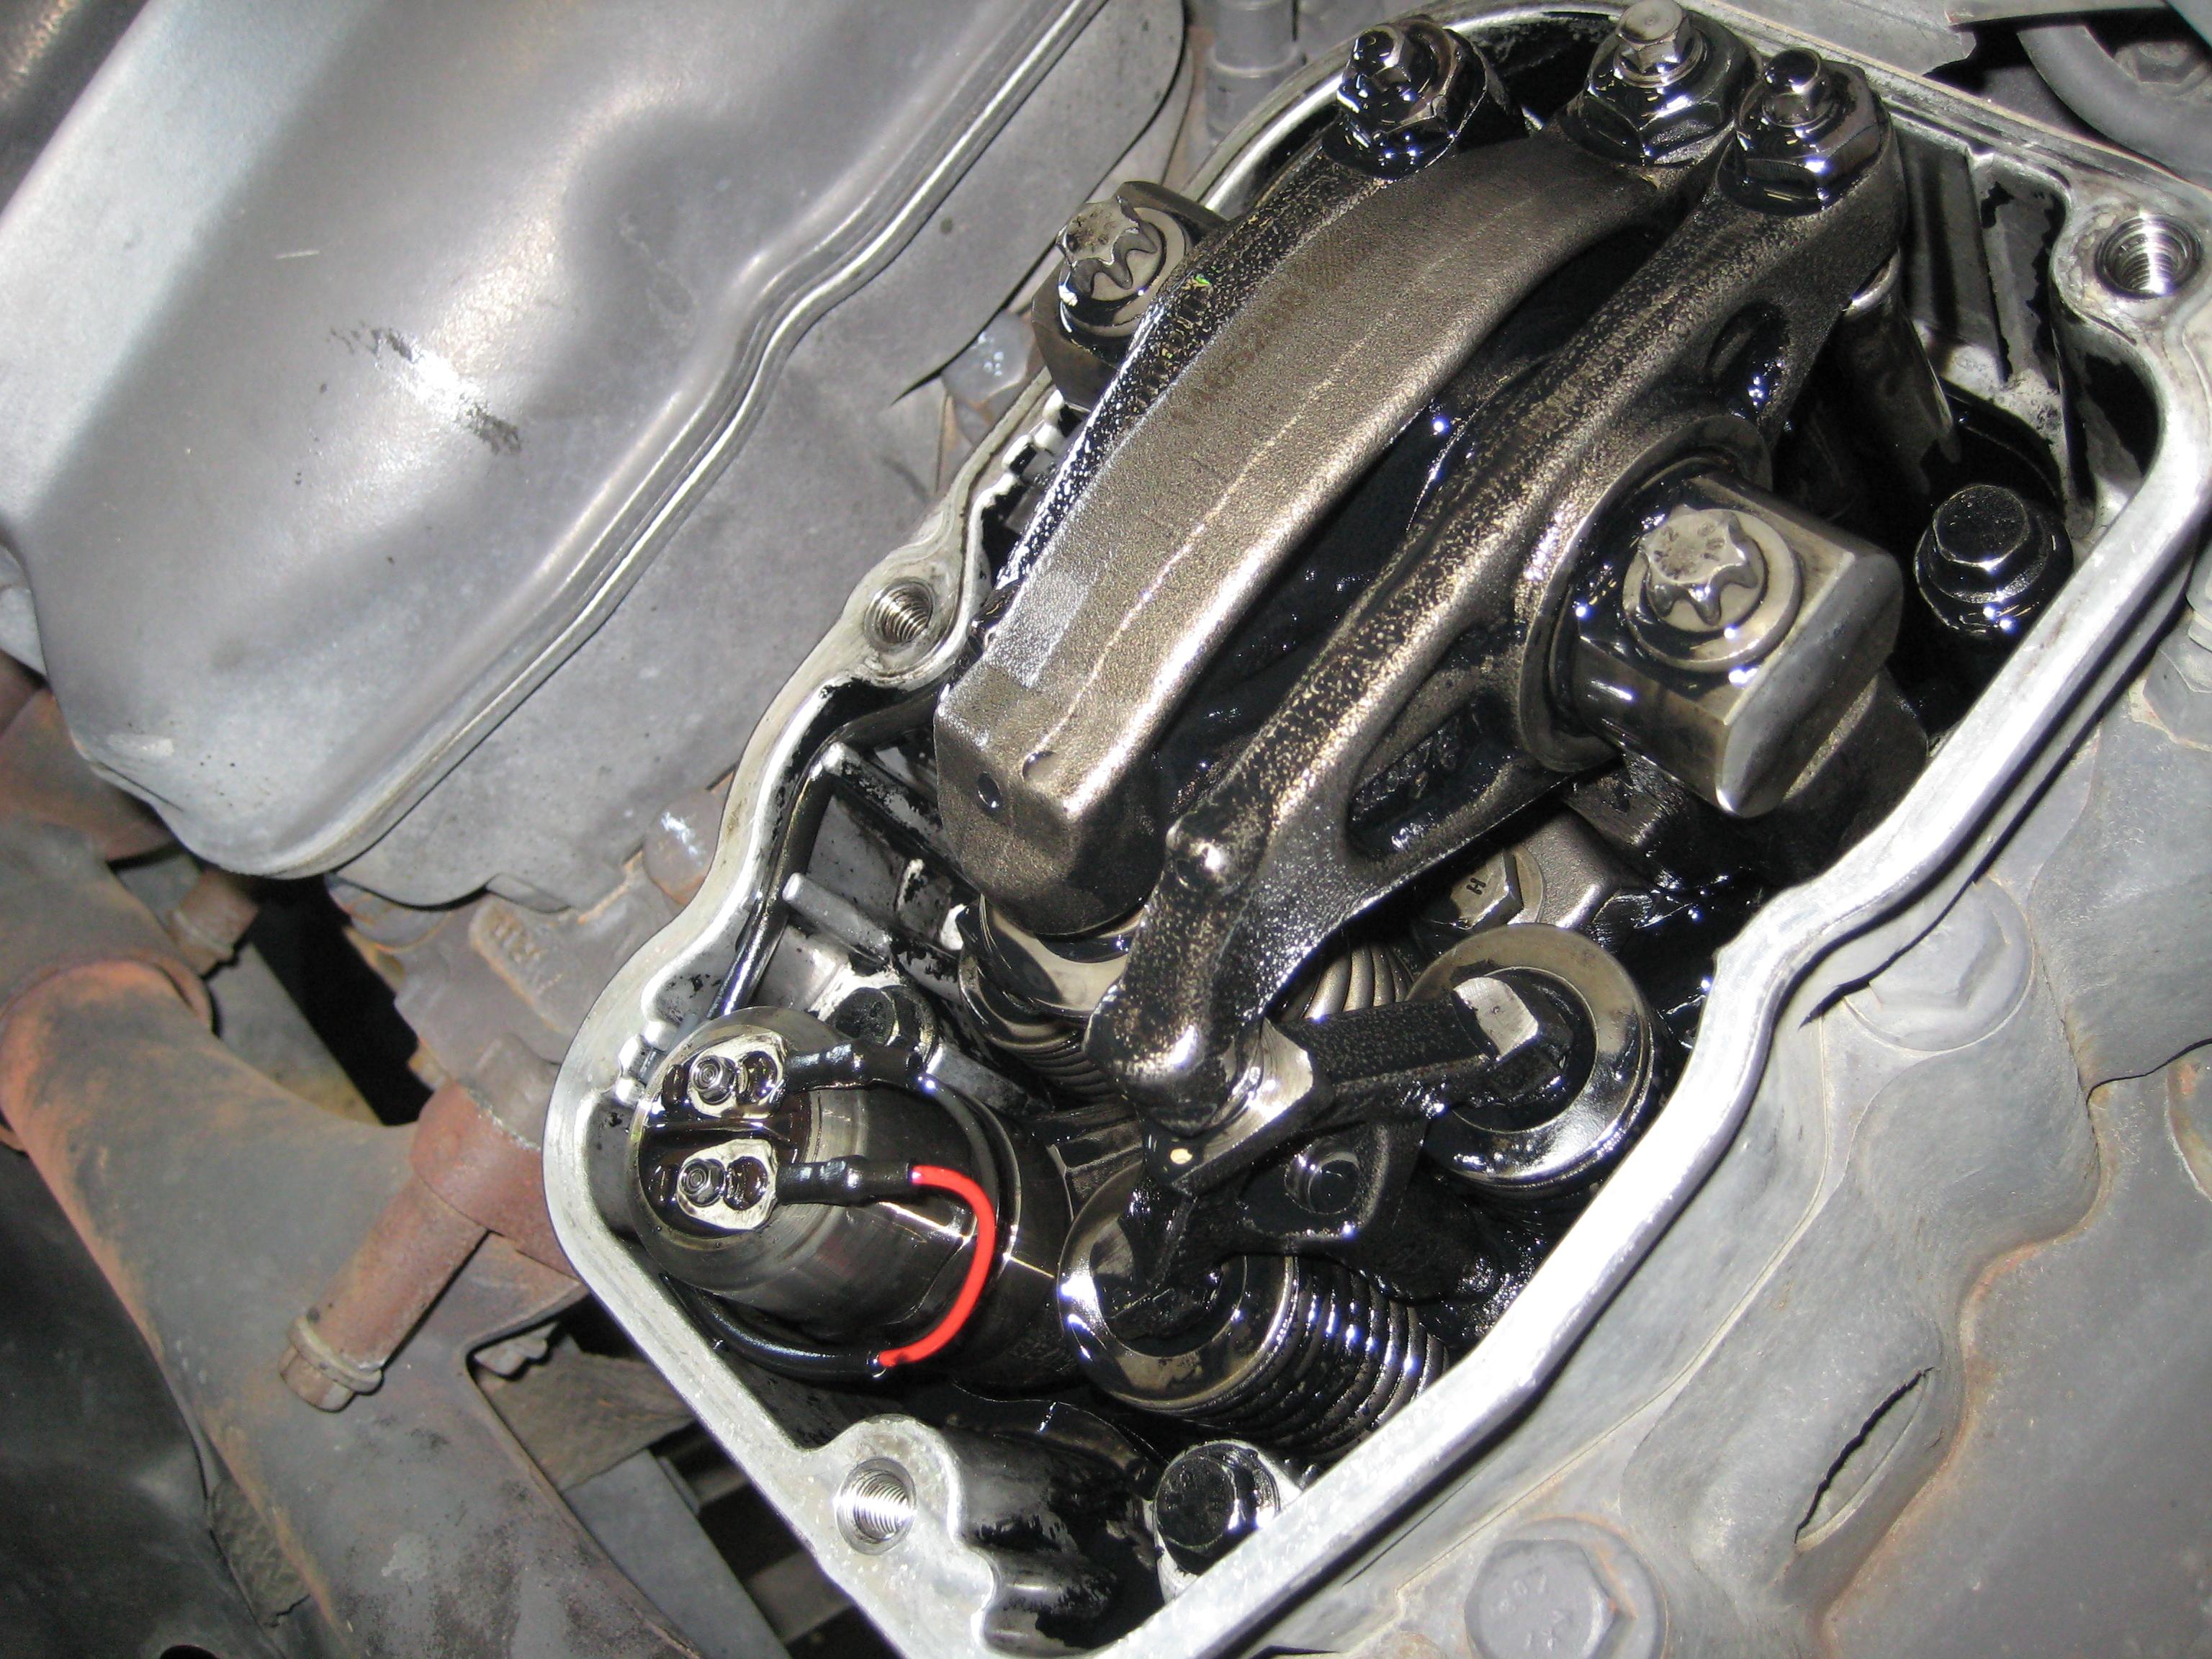 Filebosch Unit Injector Wikimedia Commons 7 3l Powerstroke Engine Diagram